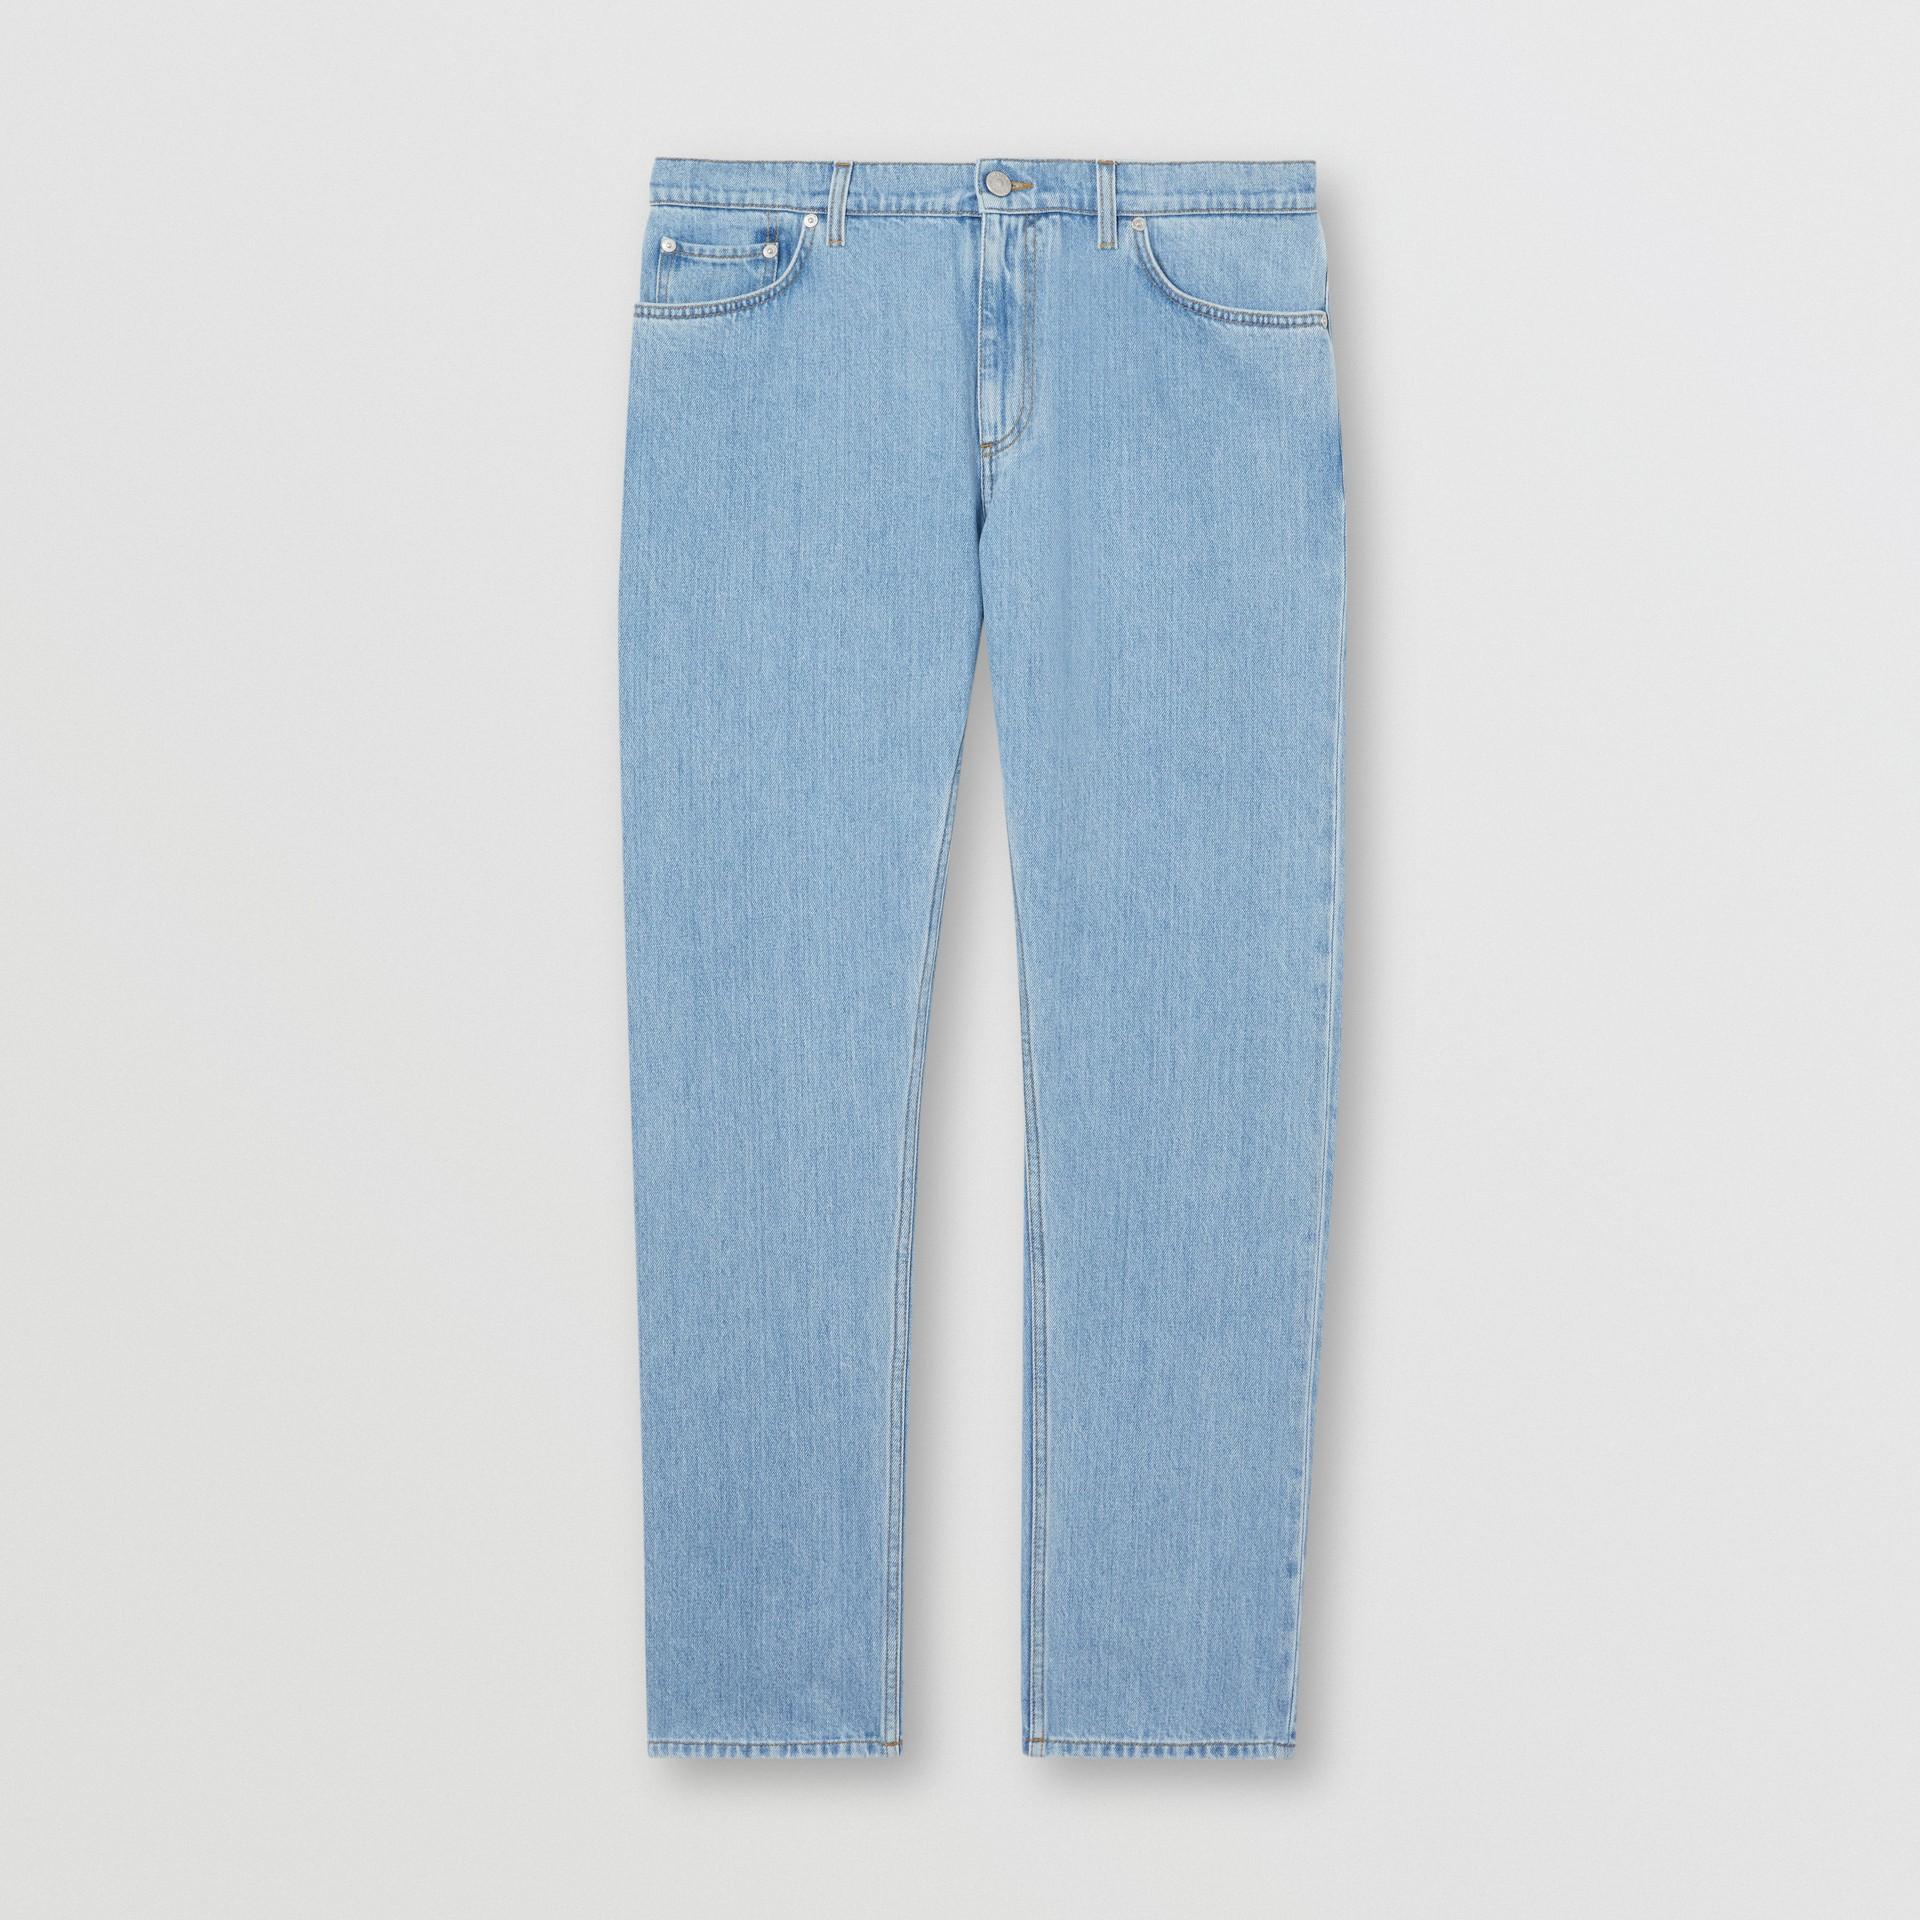 Straight Fit Japanese Denim Jeans in Light Indigo Blue - Men   Burberry - gallery image 3